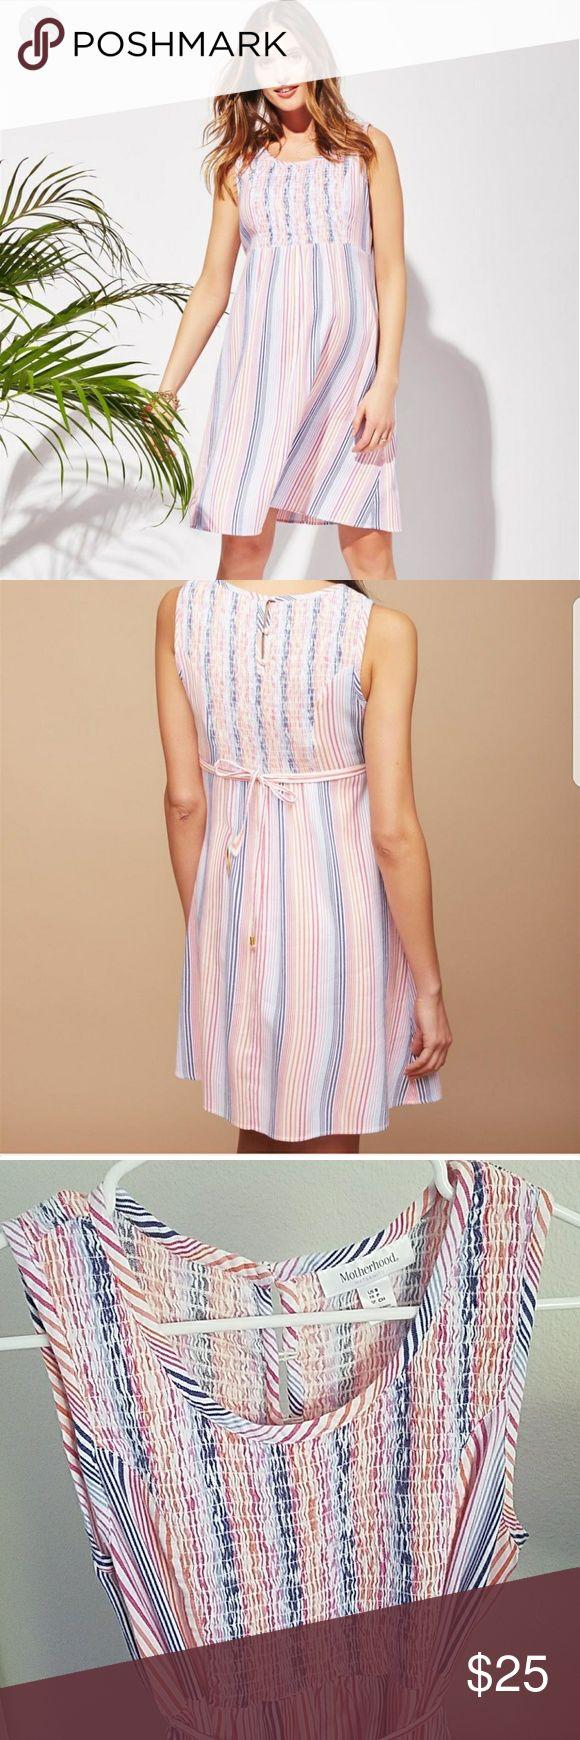 Best 20 striped maternity dresses ideas on pinterest summer nwot maternity motherhood maternity dress small ombrellifo Choice Image